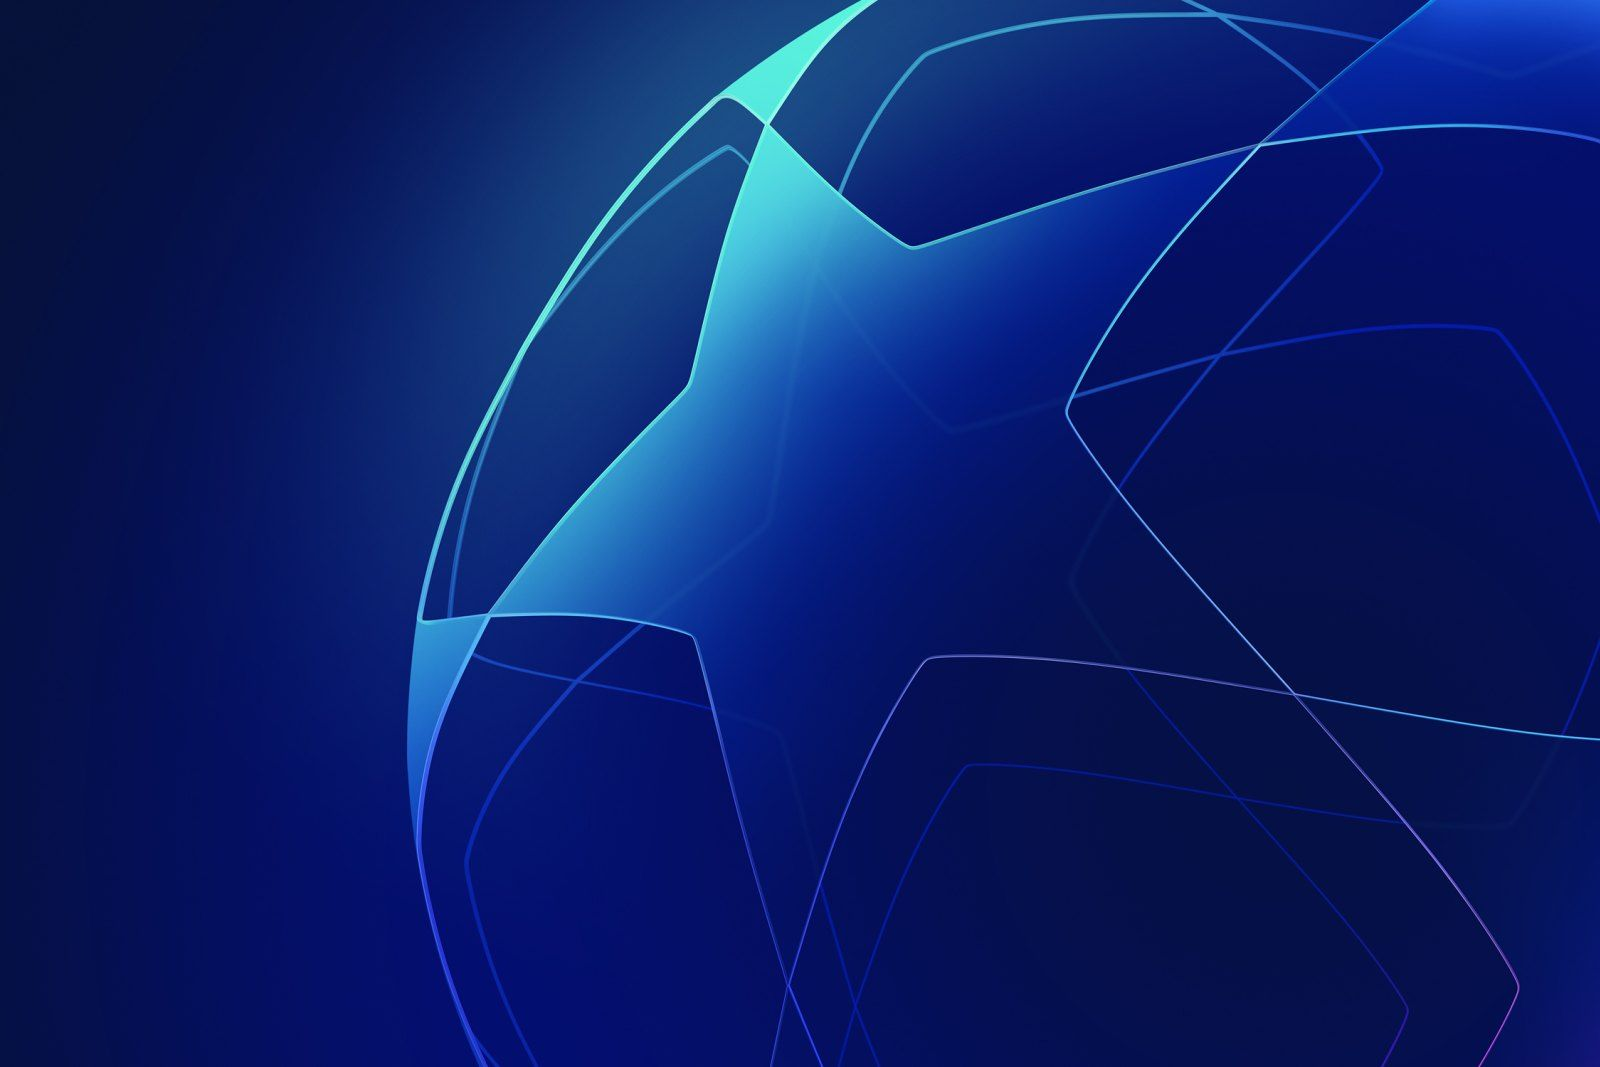 UEFA Champions League | DesignStudio | Yıldız